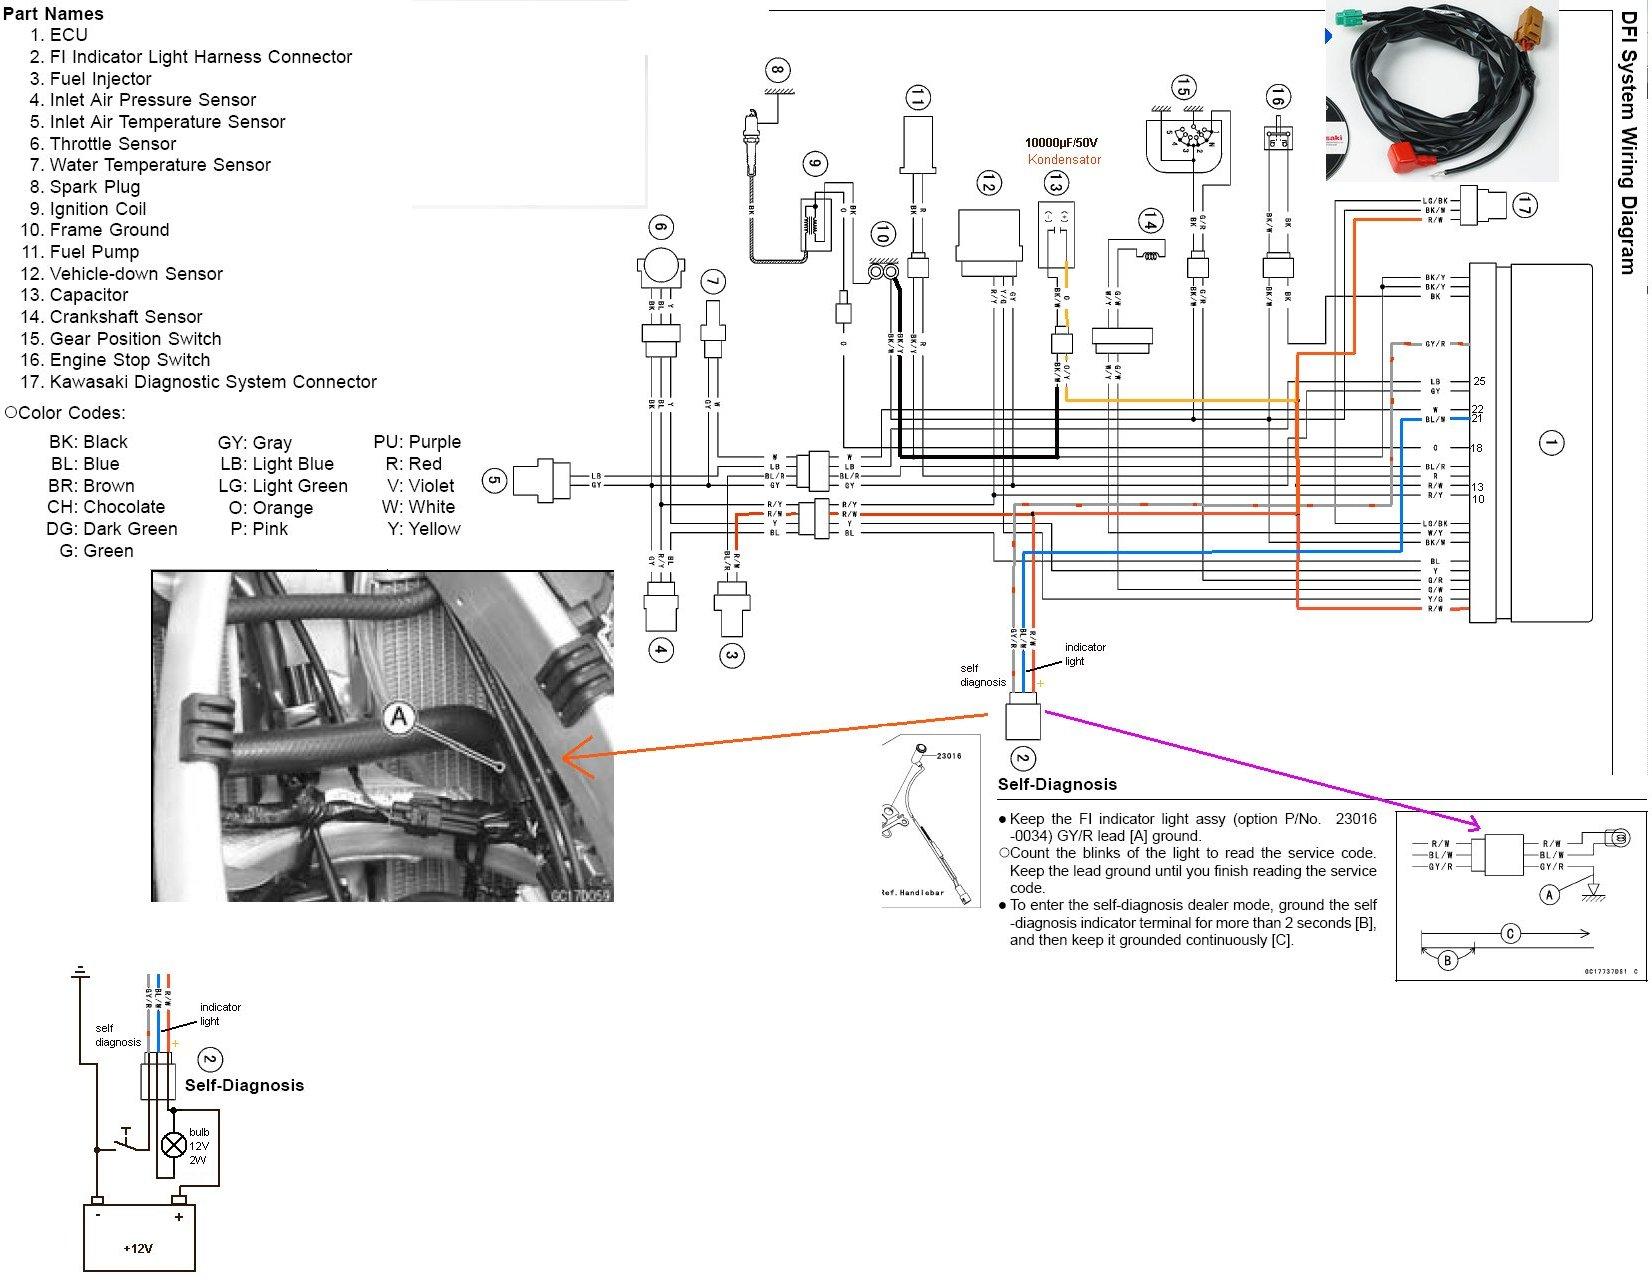 2009 kfx 450r wiring diagram